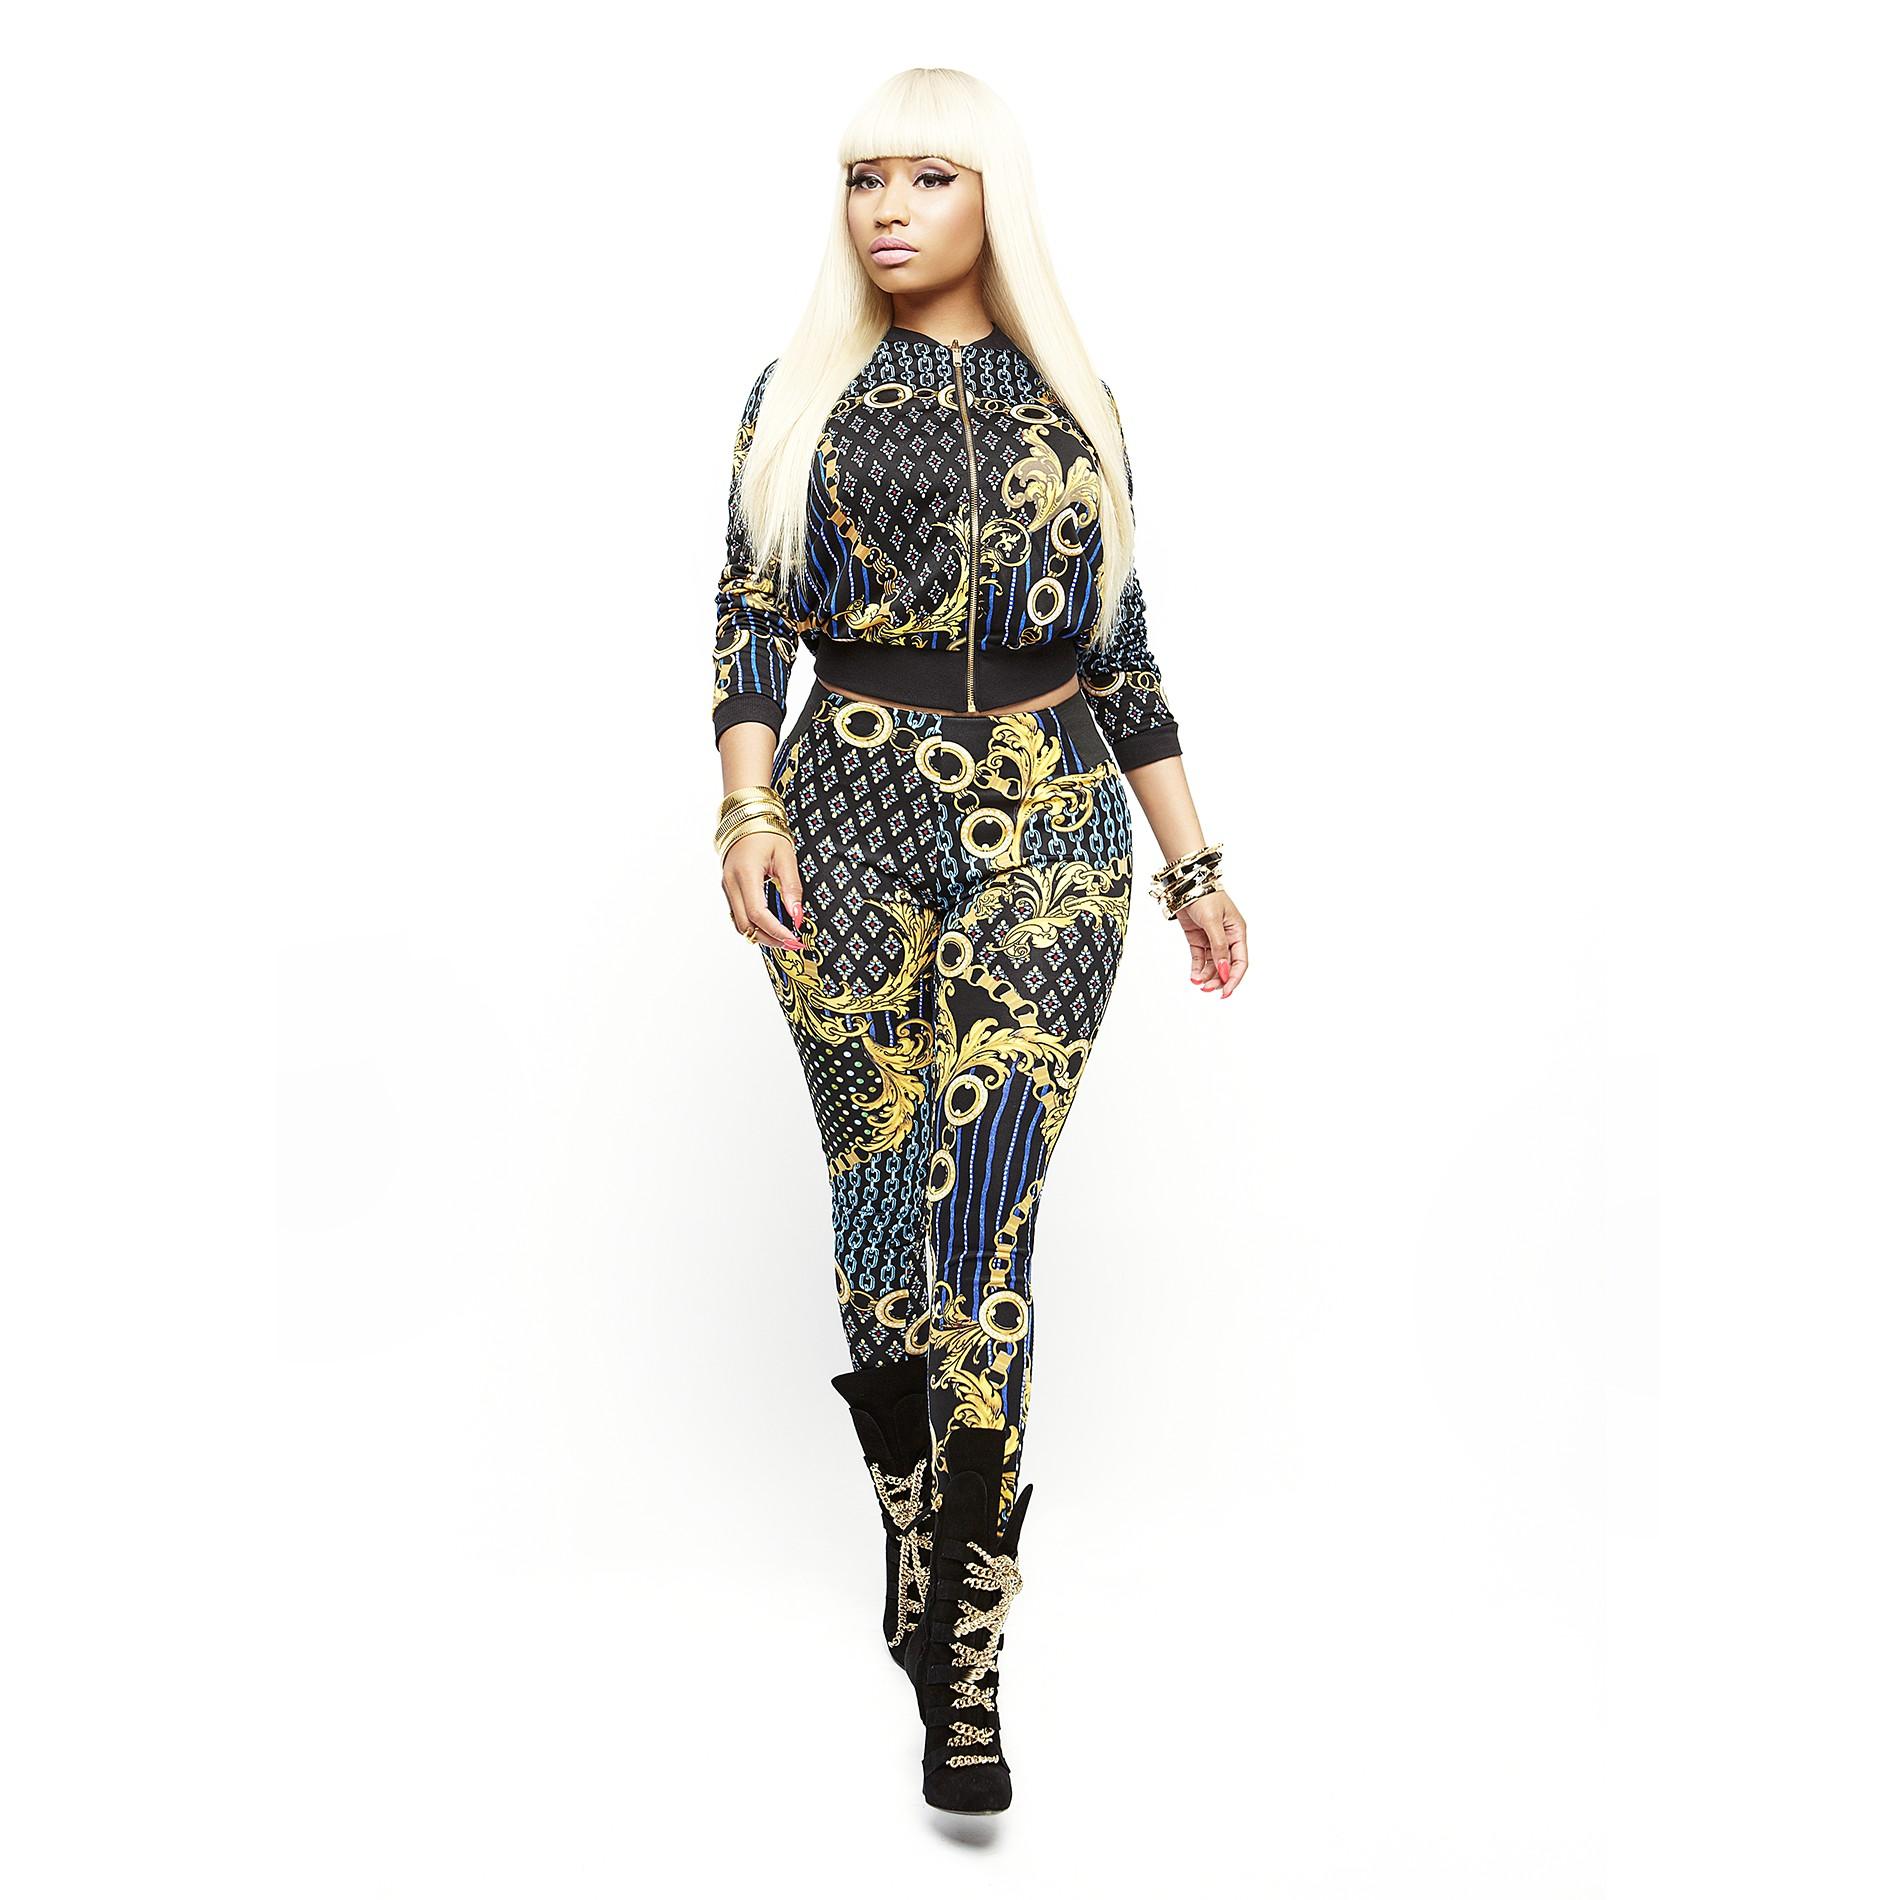 Nicki Minaj Women's Leggings - Chain Print - Clothing - Women's - Shorts & Capris